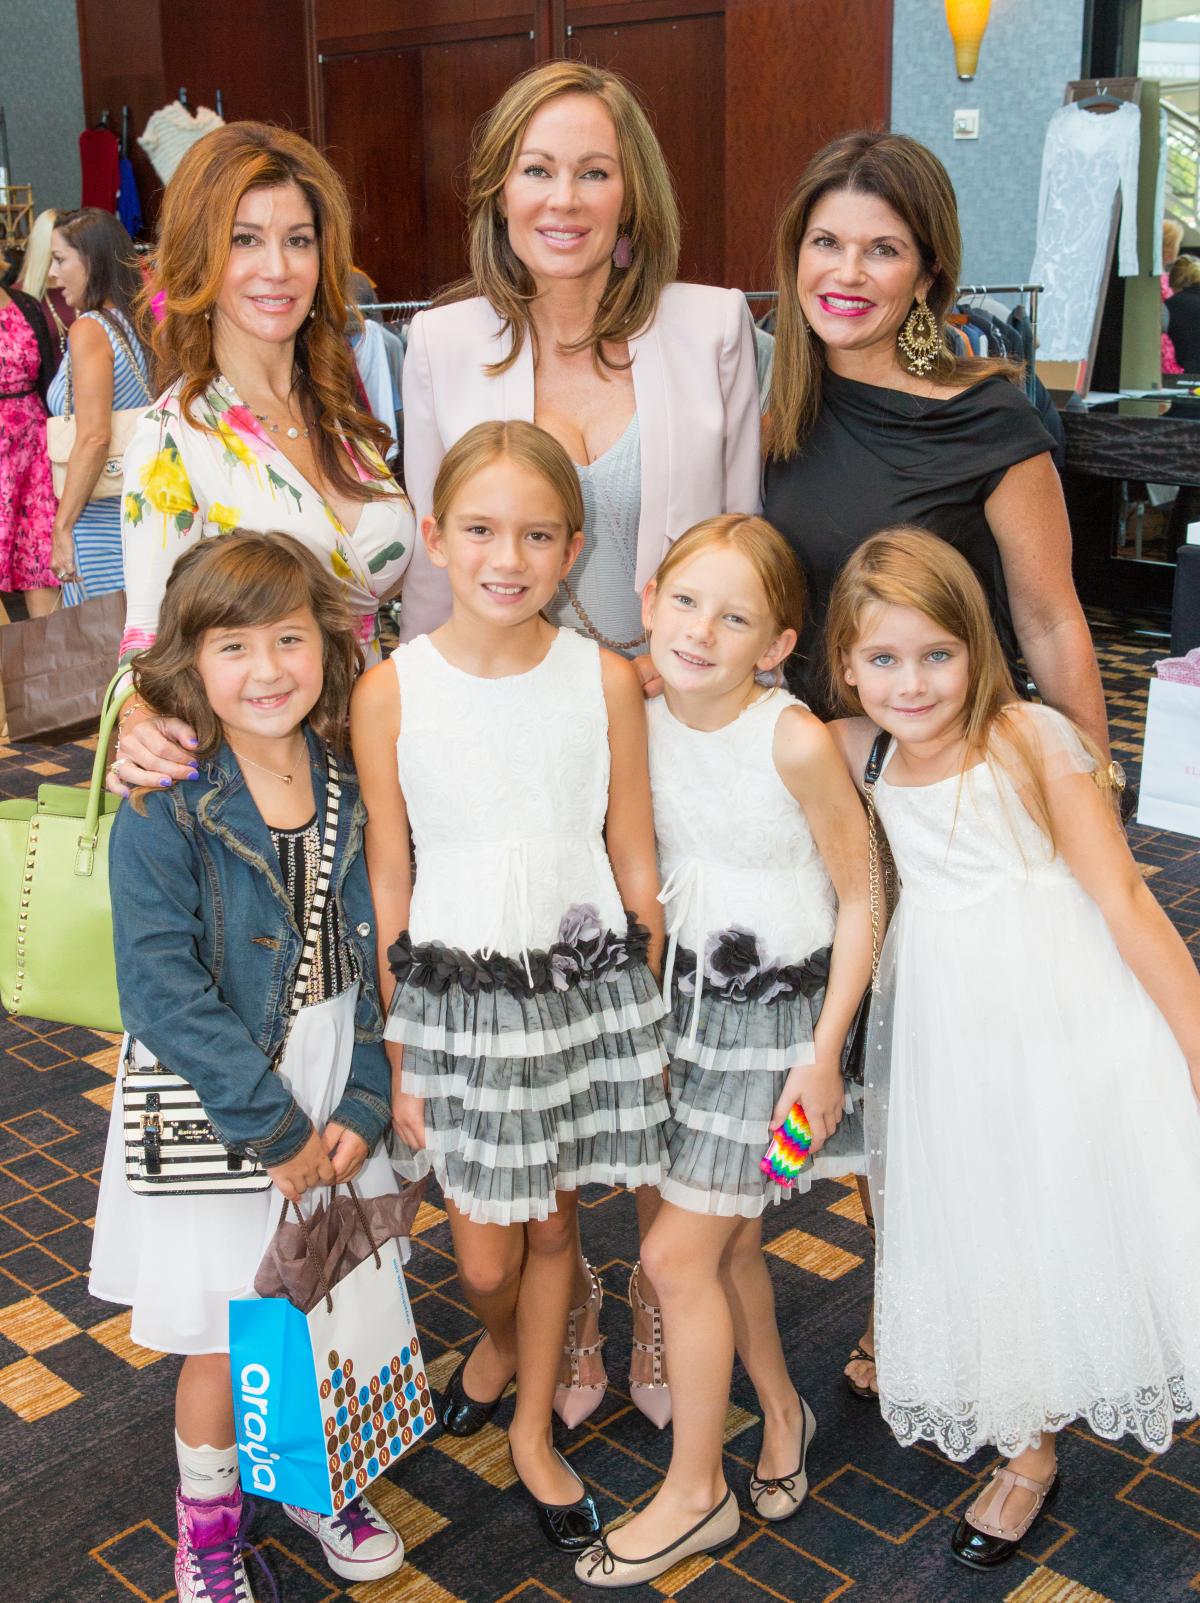 Houston, Woman's Hospital of Texas Labor Day Luncheon, August 2015, Vicsandra Jones, Brandi Maxwell, Laura Davenport